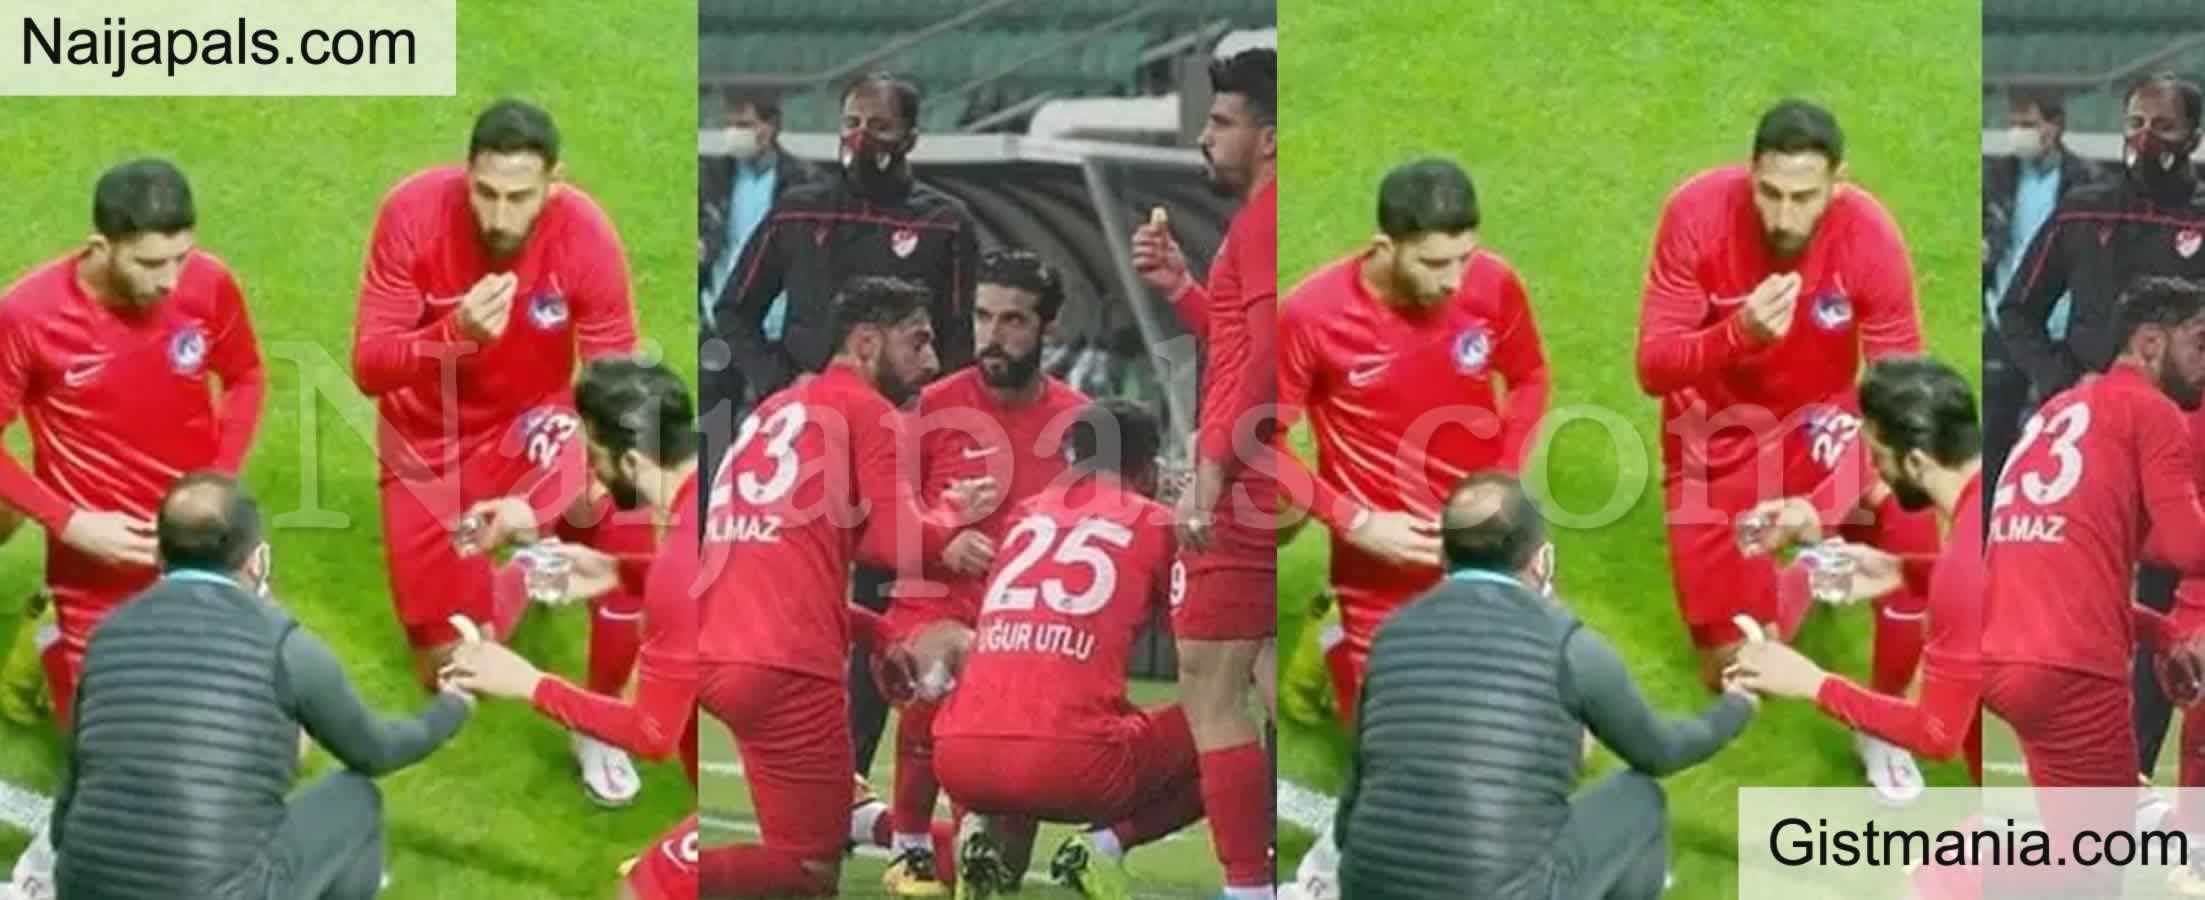 <img alt='.' class='lazyload' data-src='https://img.gistmania.com/emot/soccer.gif' /><img alt='.' class='lazyload' data-src='https://img.gistmania.com/emot/news.gif' /> <b>Players Break Their Ramadan Fast During a Football Match In Turkey</b> (Video)